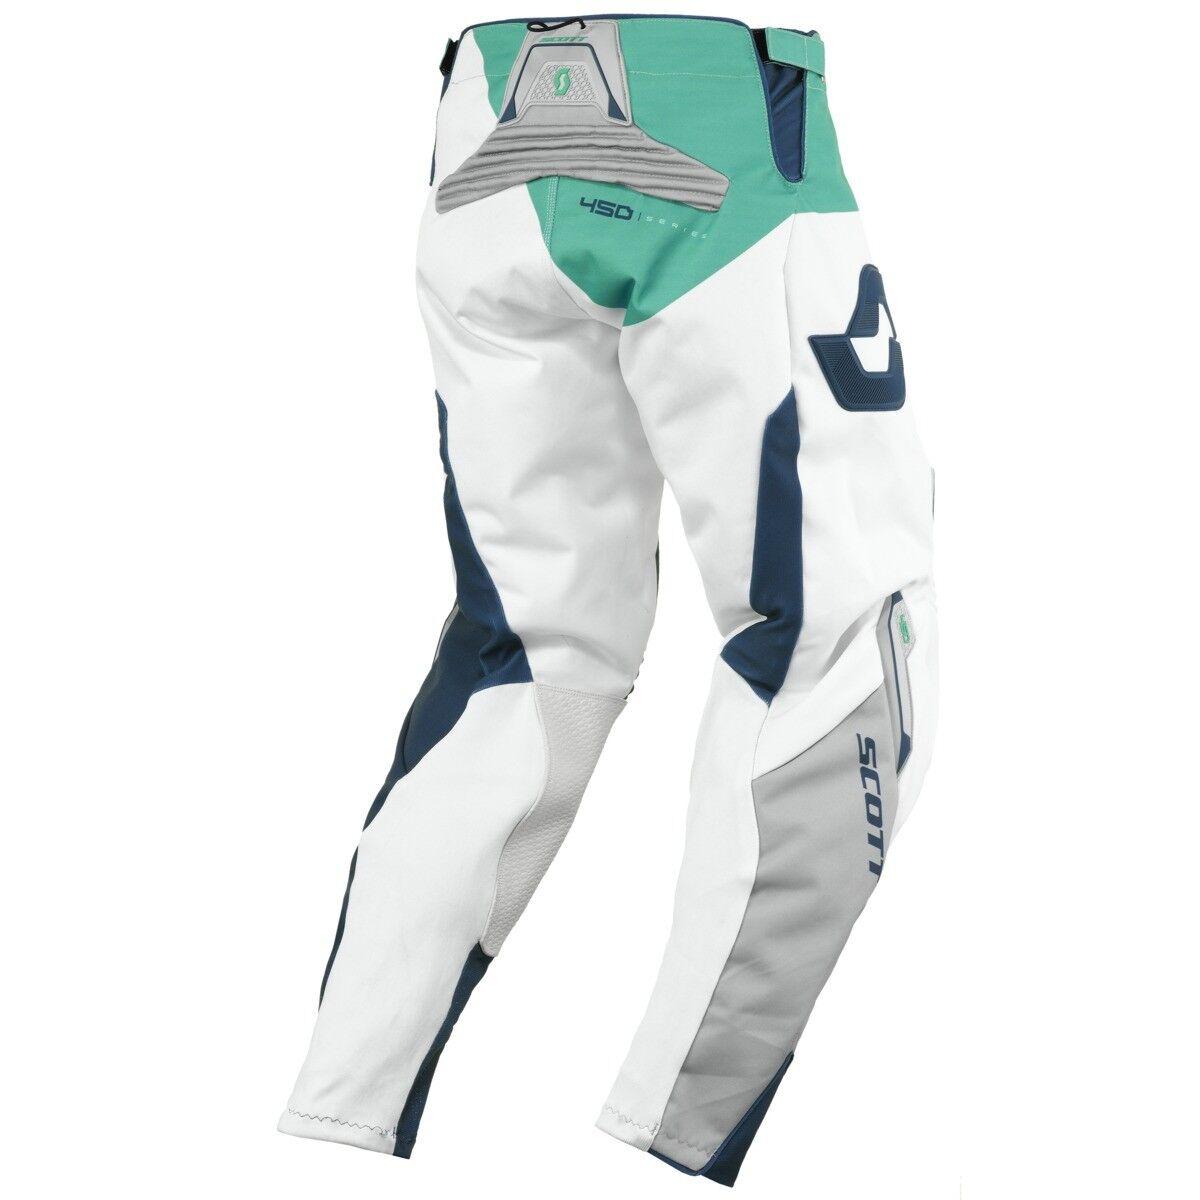 Scott Hose 450 Podium MX Motocross / DH Fahrrad Hose Scott blau/weiß/grün 2016 89f8a5